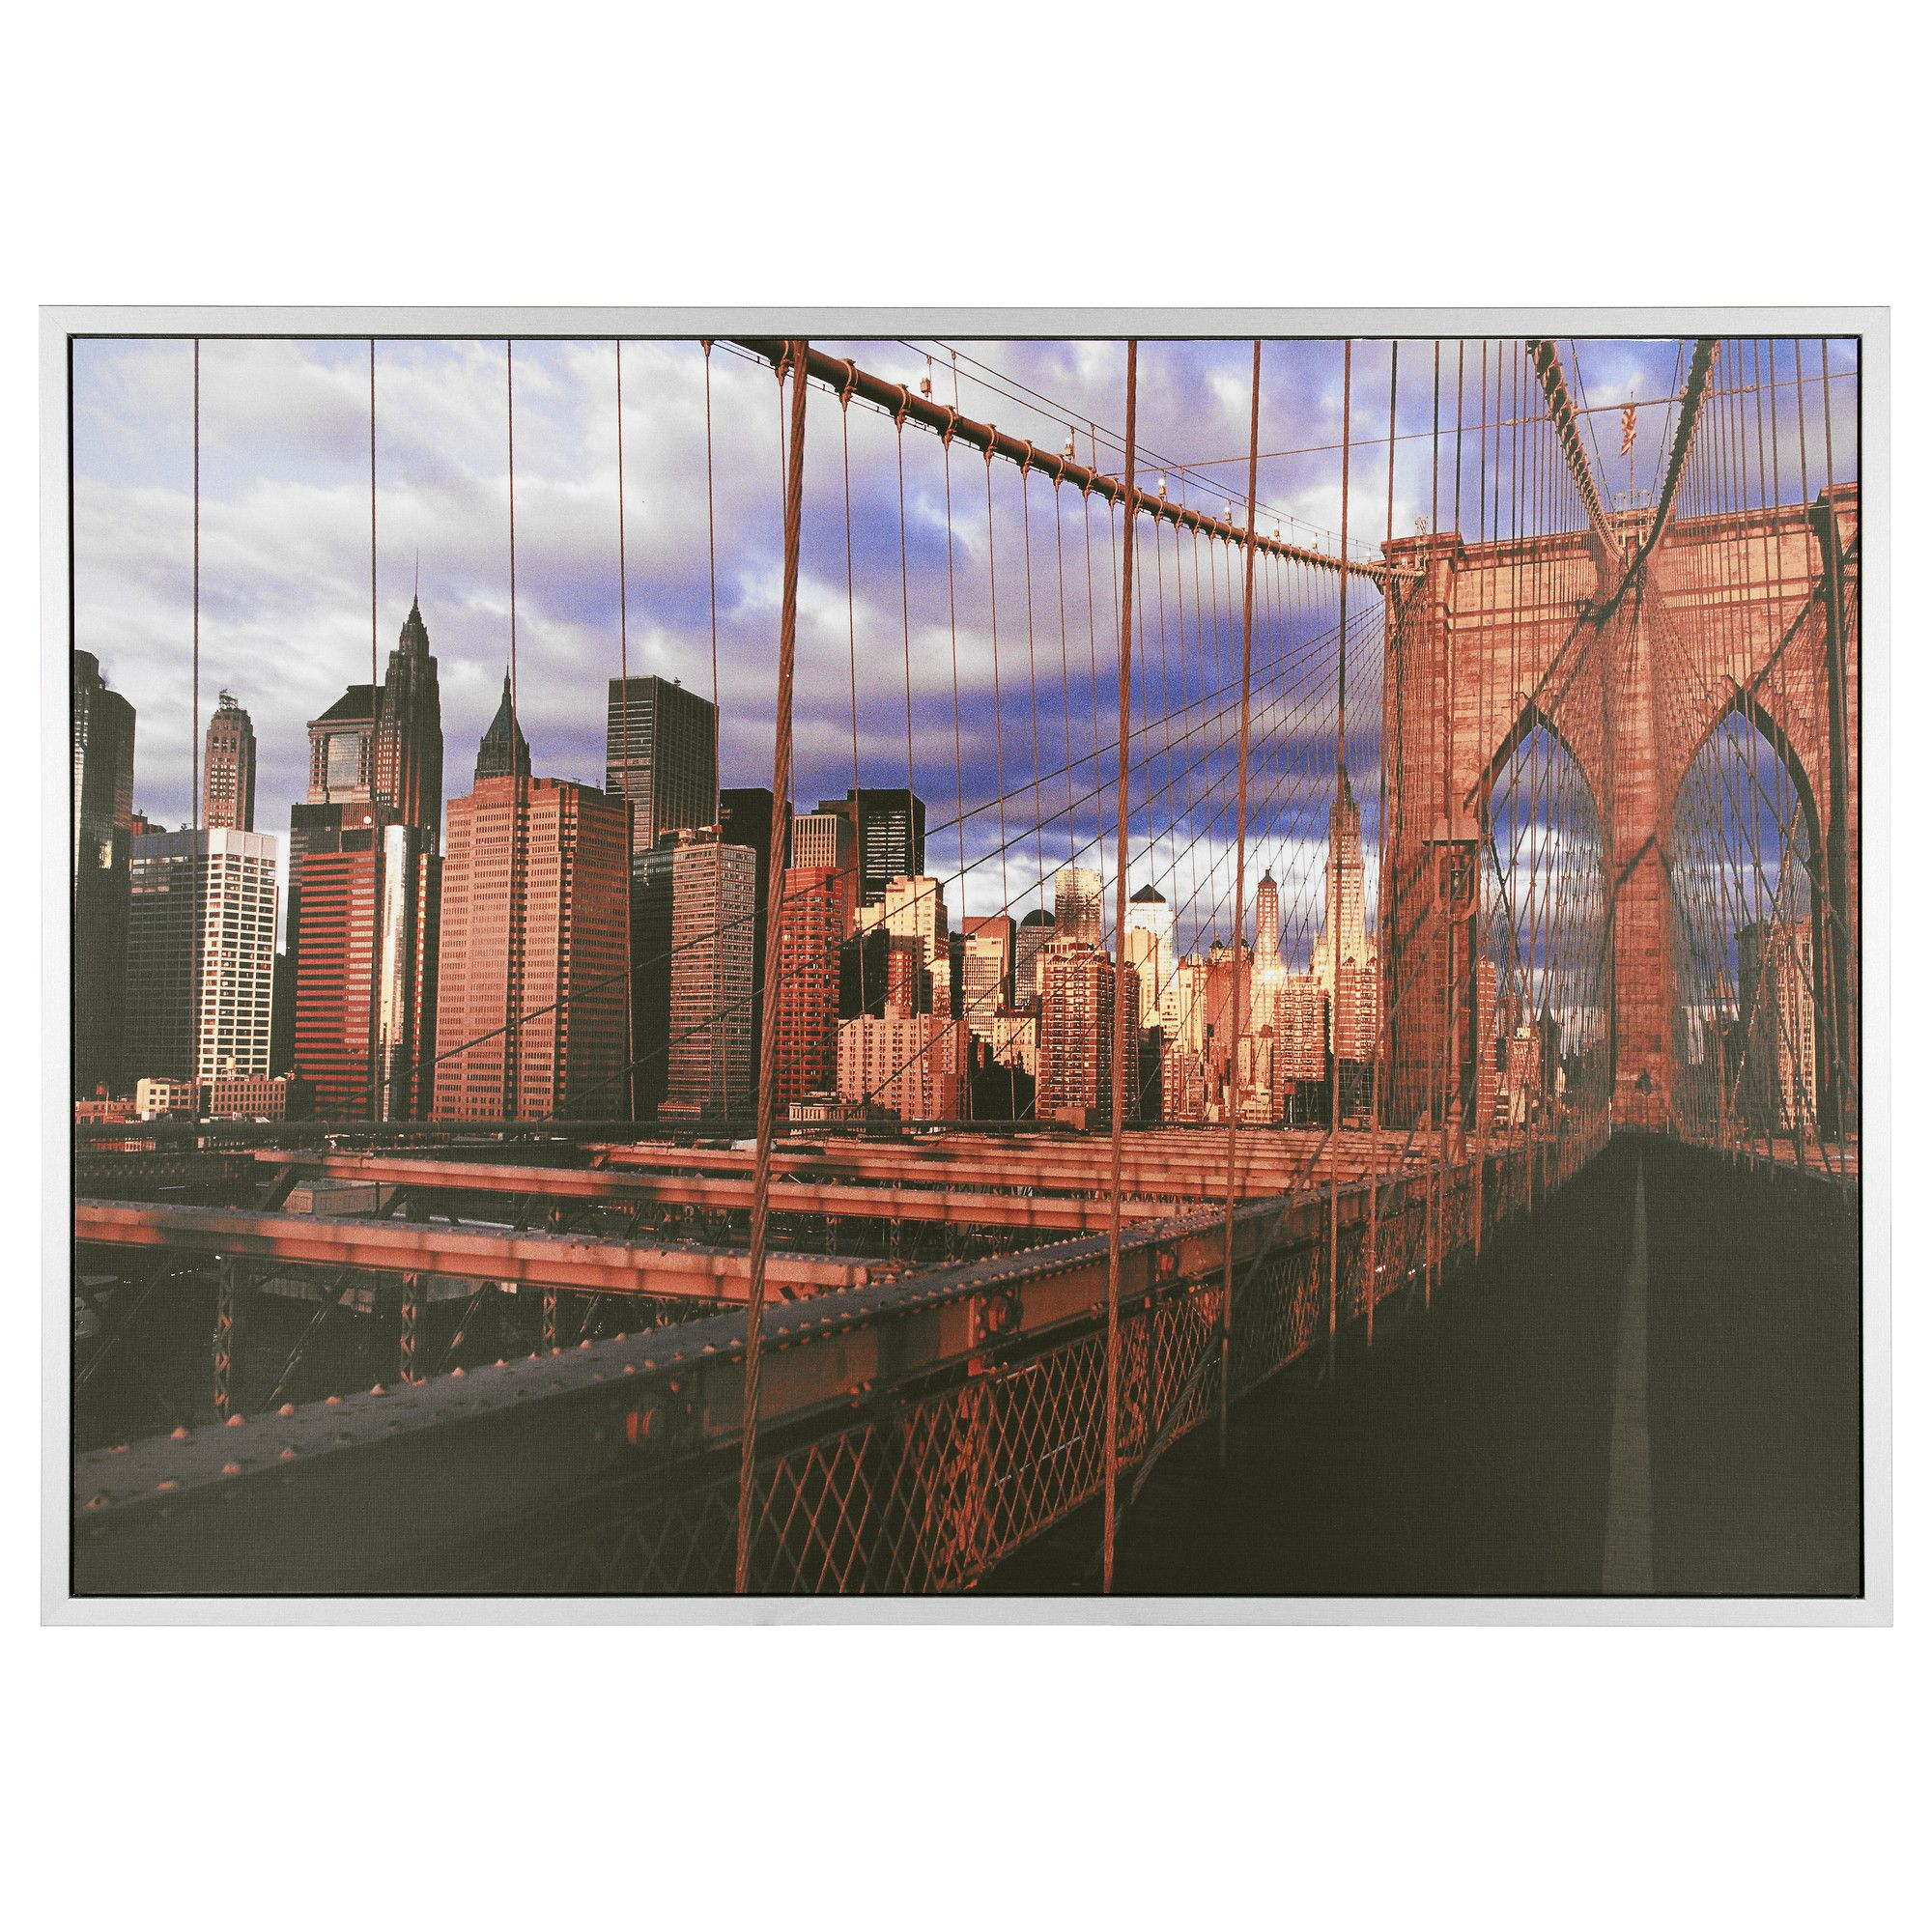 ikea pictures brooklyn bridge pictures